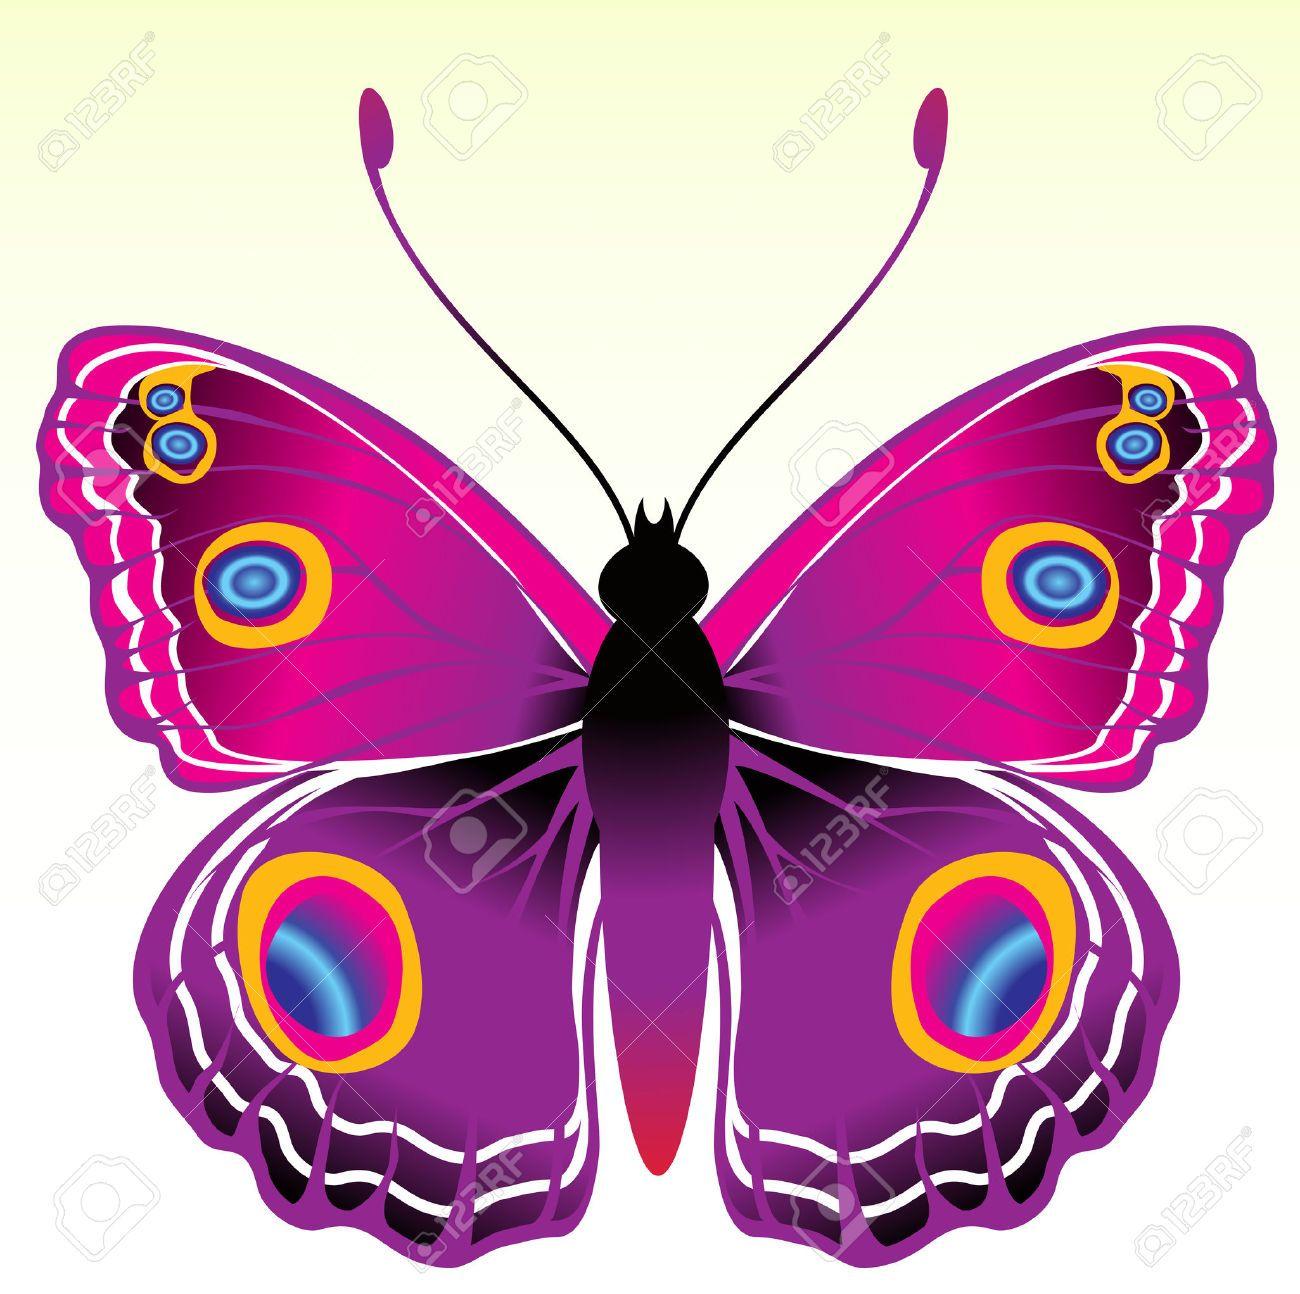 mariposas de colores buscar con google mariposas